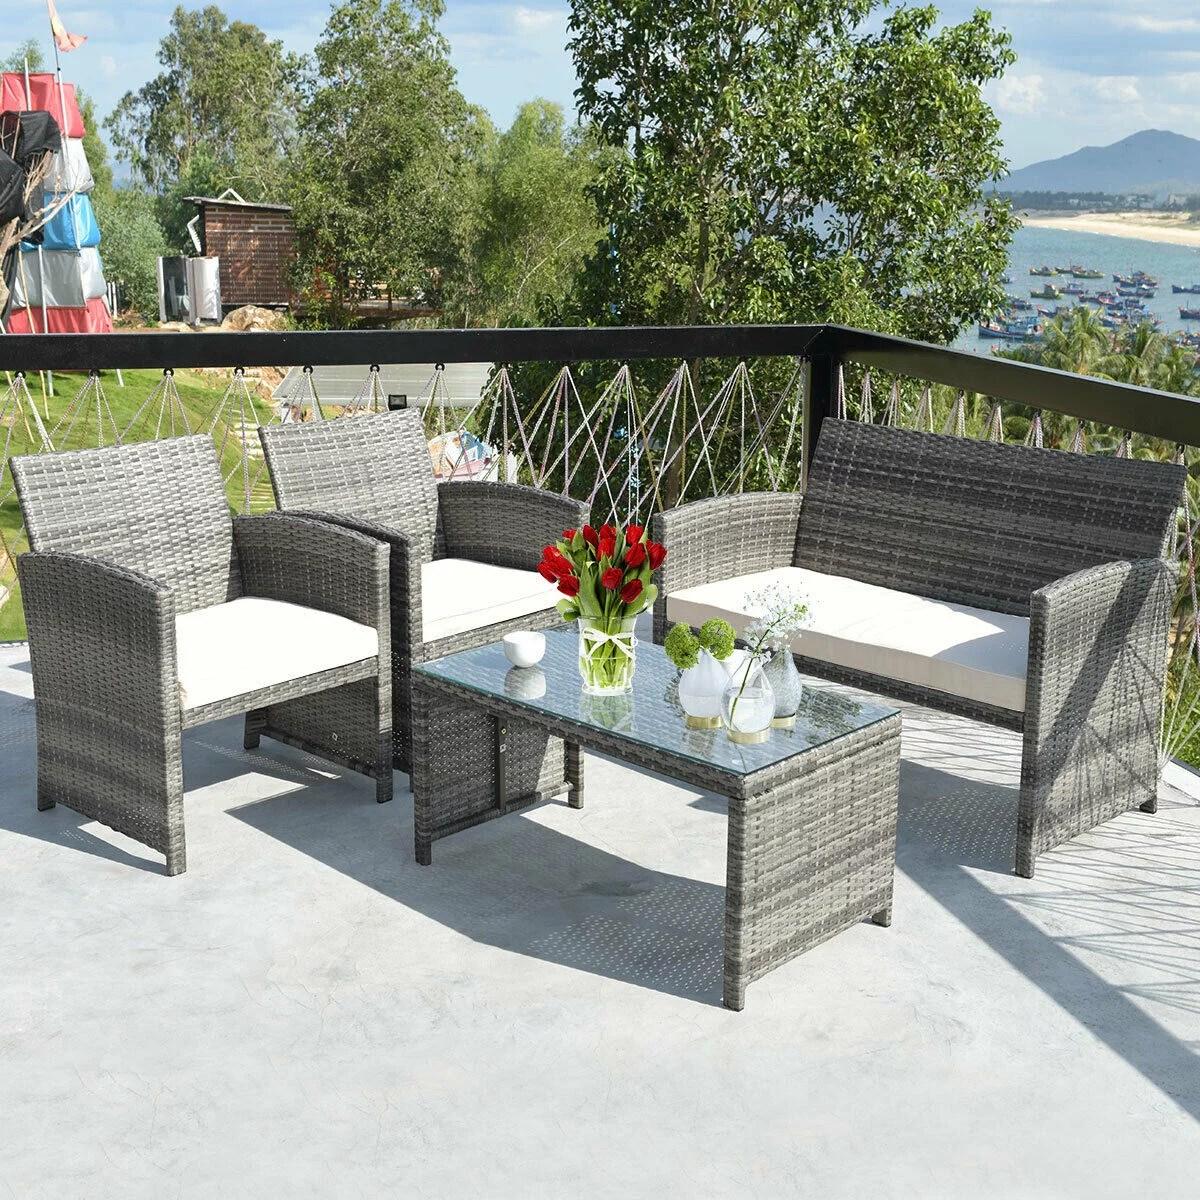 costway 4 pc rattan patio furniture set garden sofa with white cushions